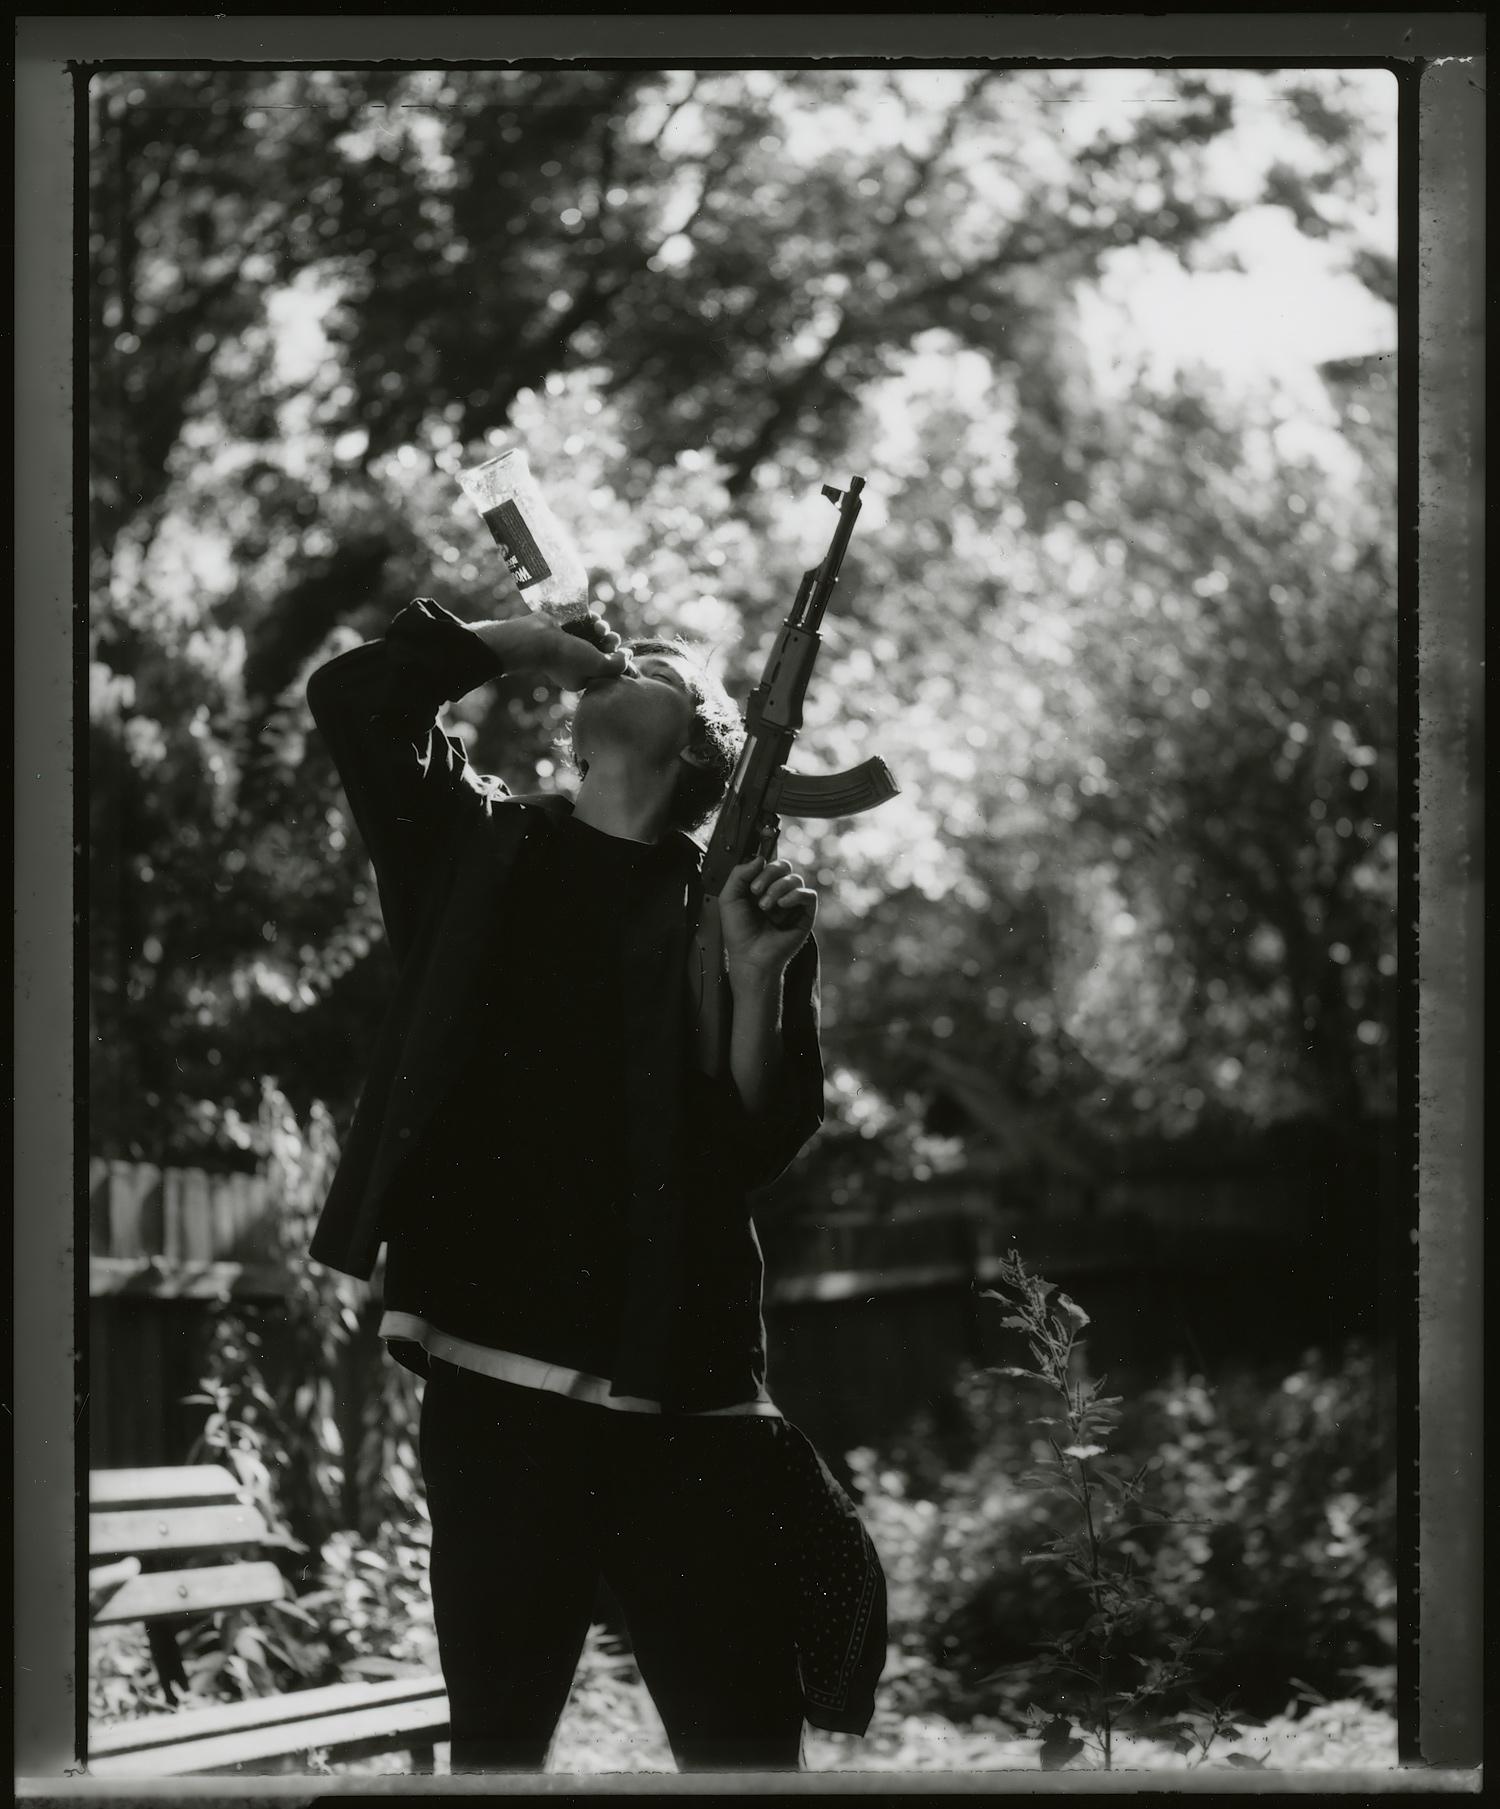 <i>Lynch</i>, 2008, Polaroid 665, 10.8 x 8.5 cm